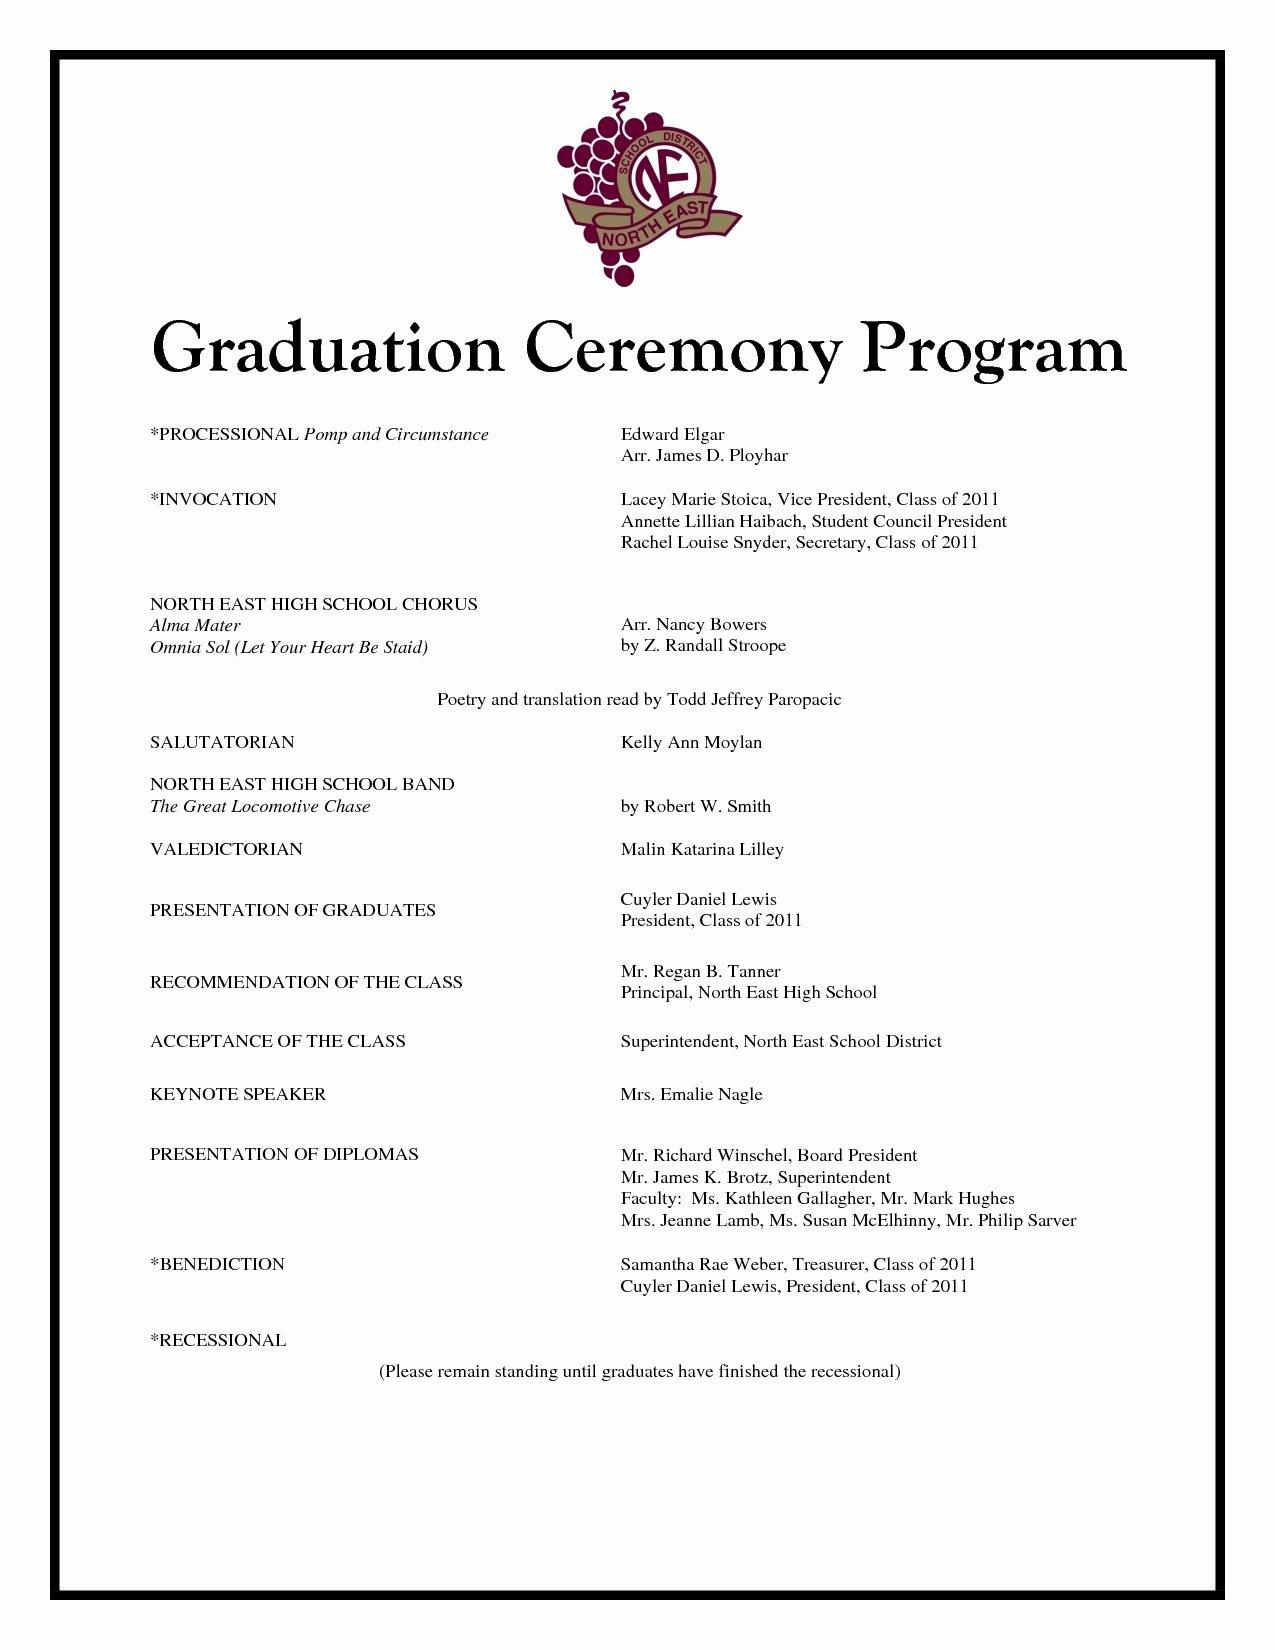 Graduation Ceremony Program Template Best Of Graduation Program Template Templates Collections